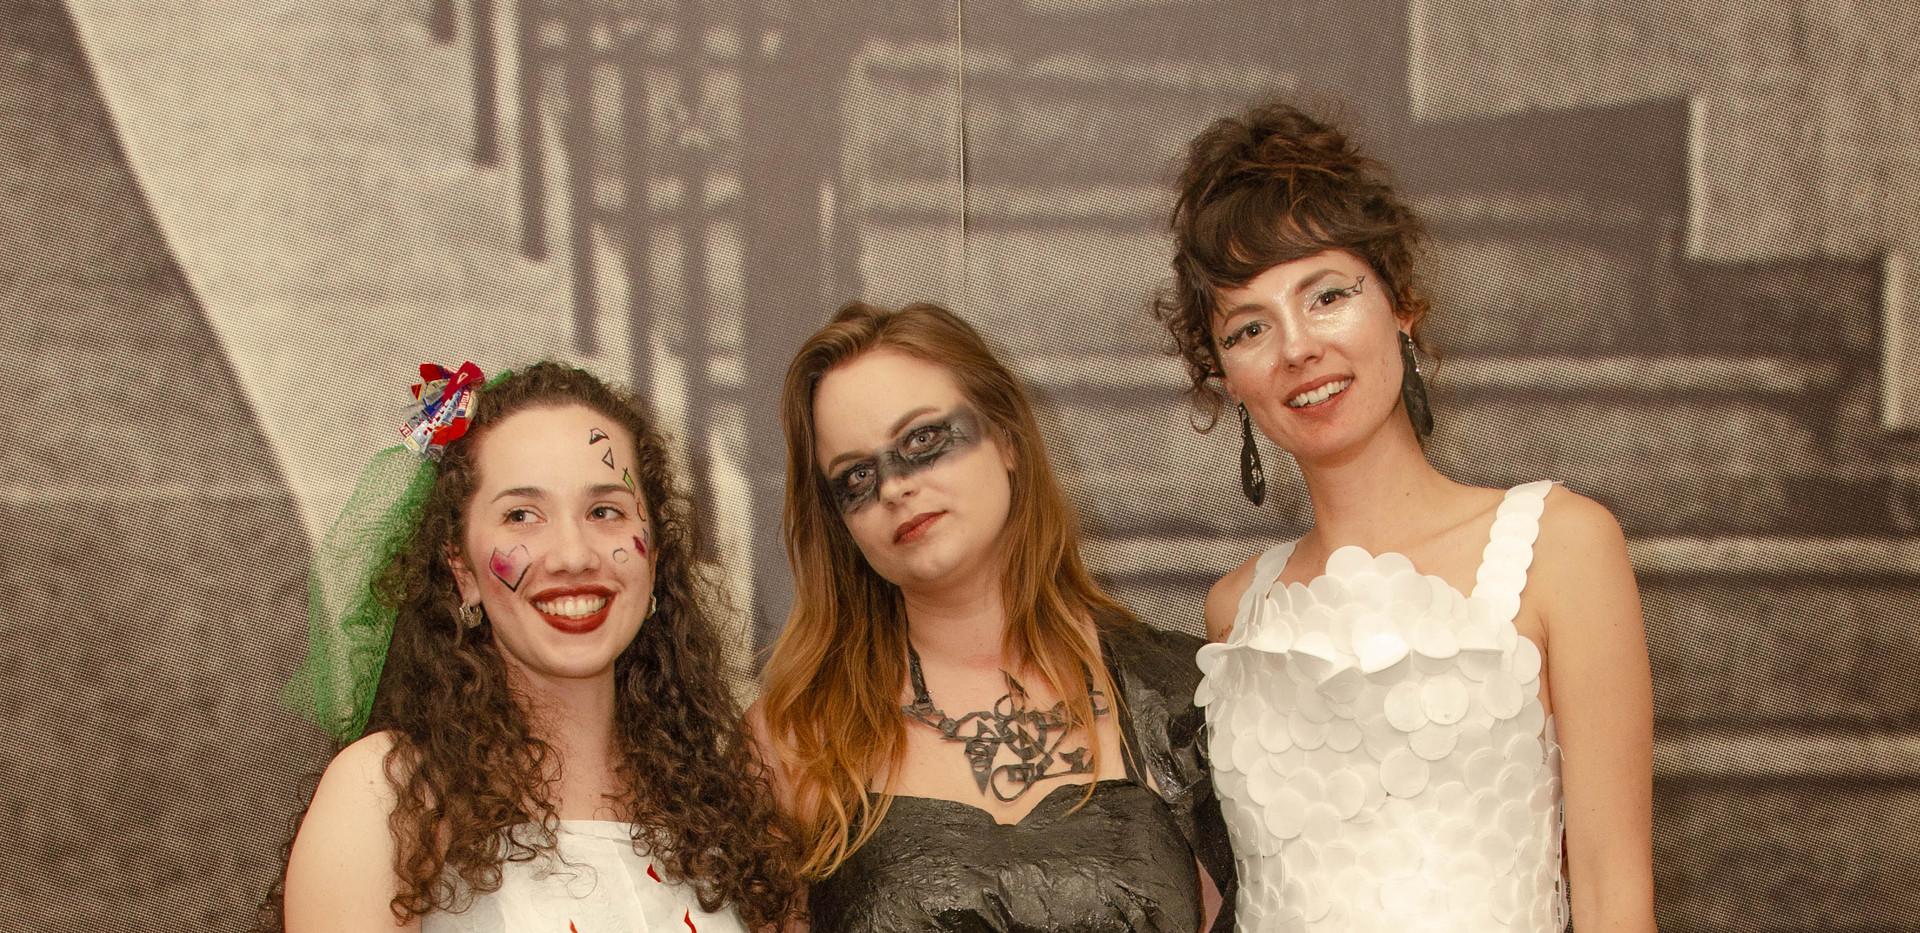 Rose, Erin, Asha in costume